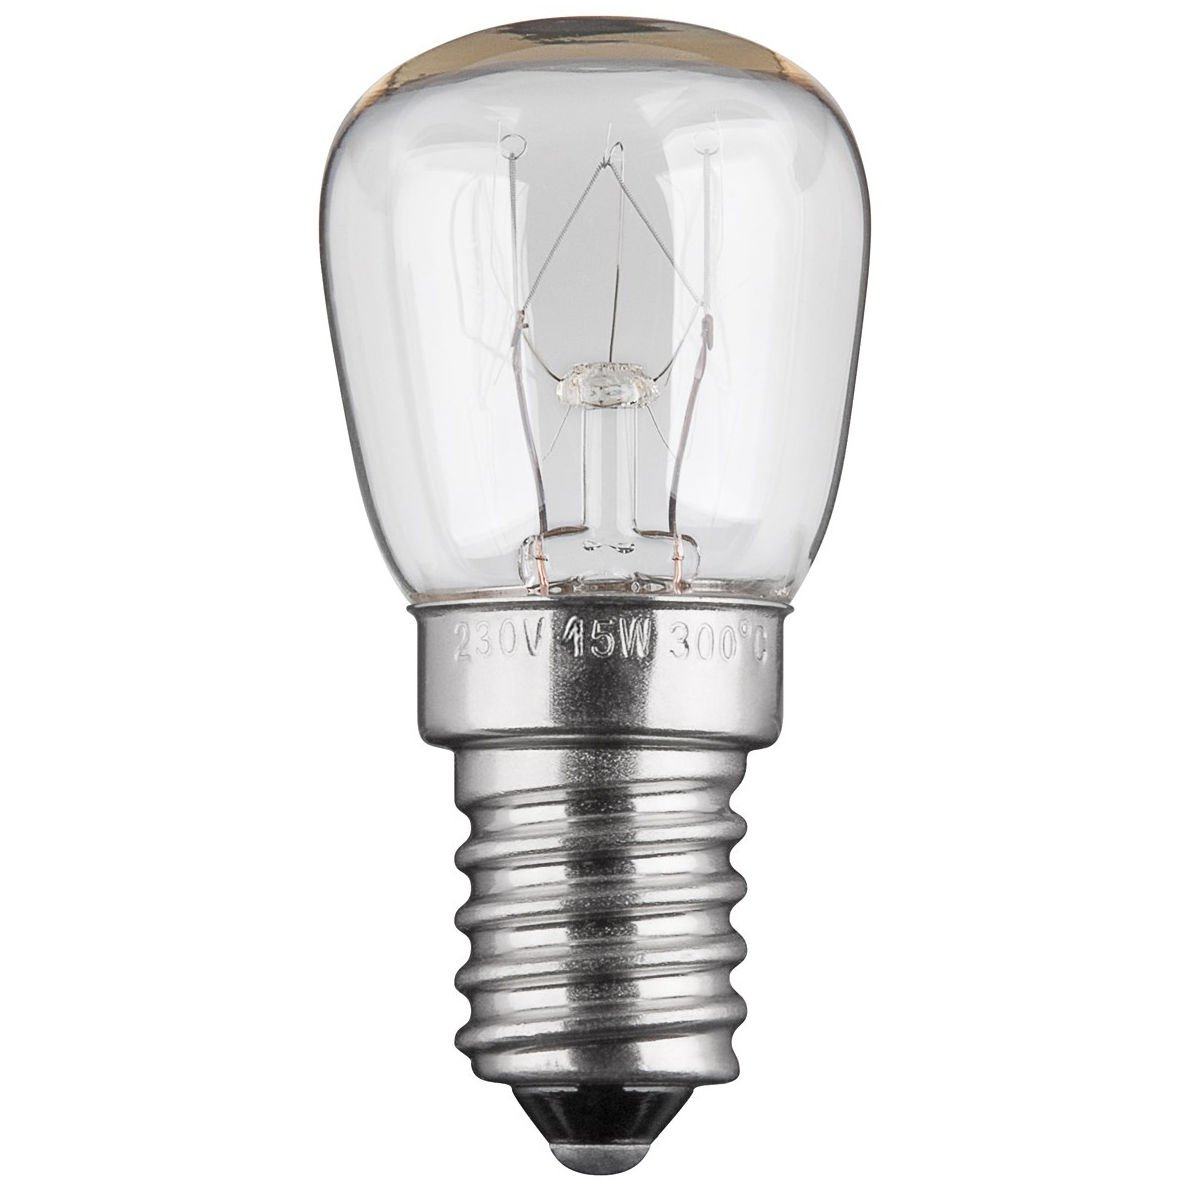 10 Stück 15W Backofenlampe Glühbirne Glühlampe Backofen E14, 230V, Backofenglühbirne Backofenglühbirne PerfectHD